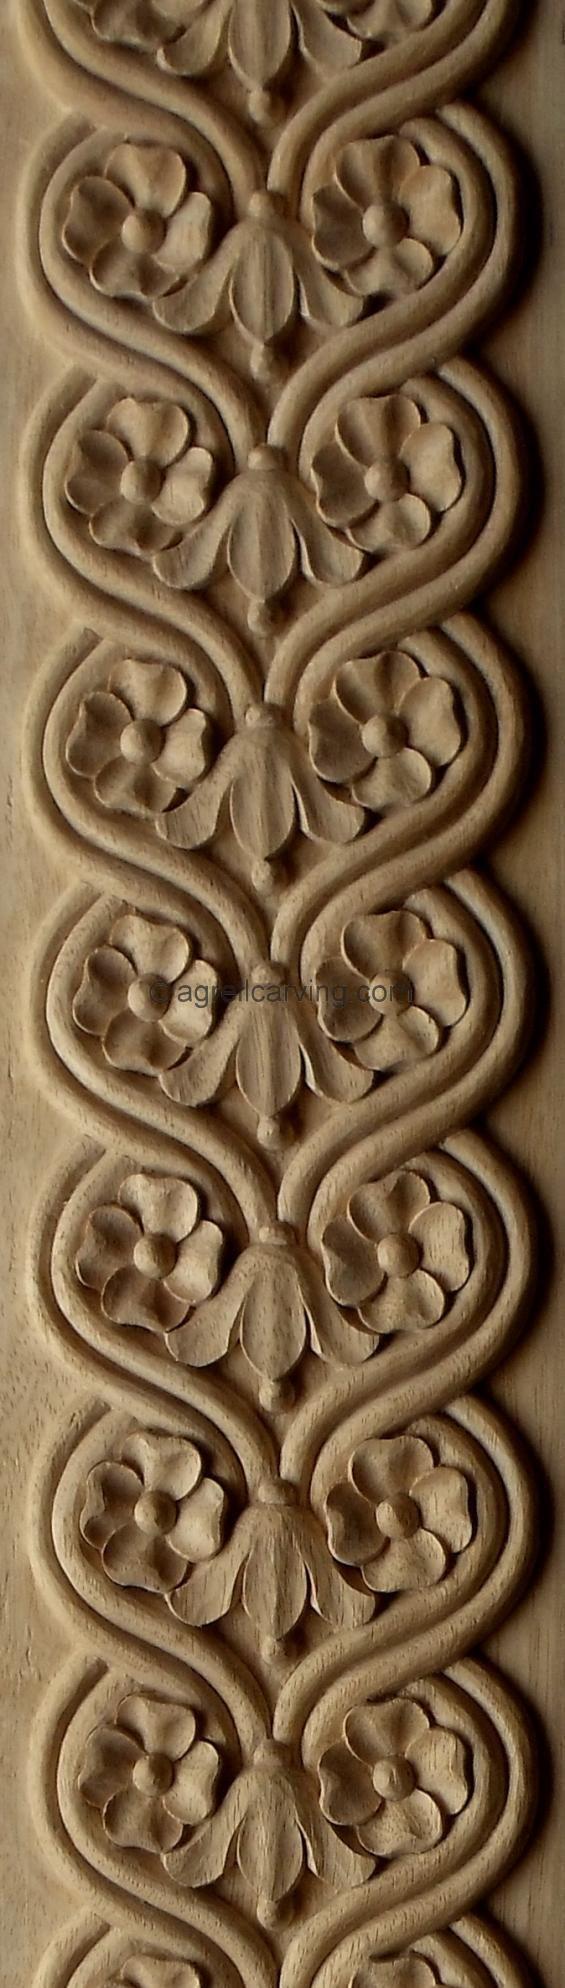 Interwoven guilloche ahşap oyma pinterest wood